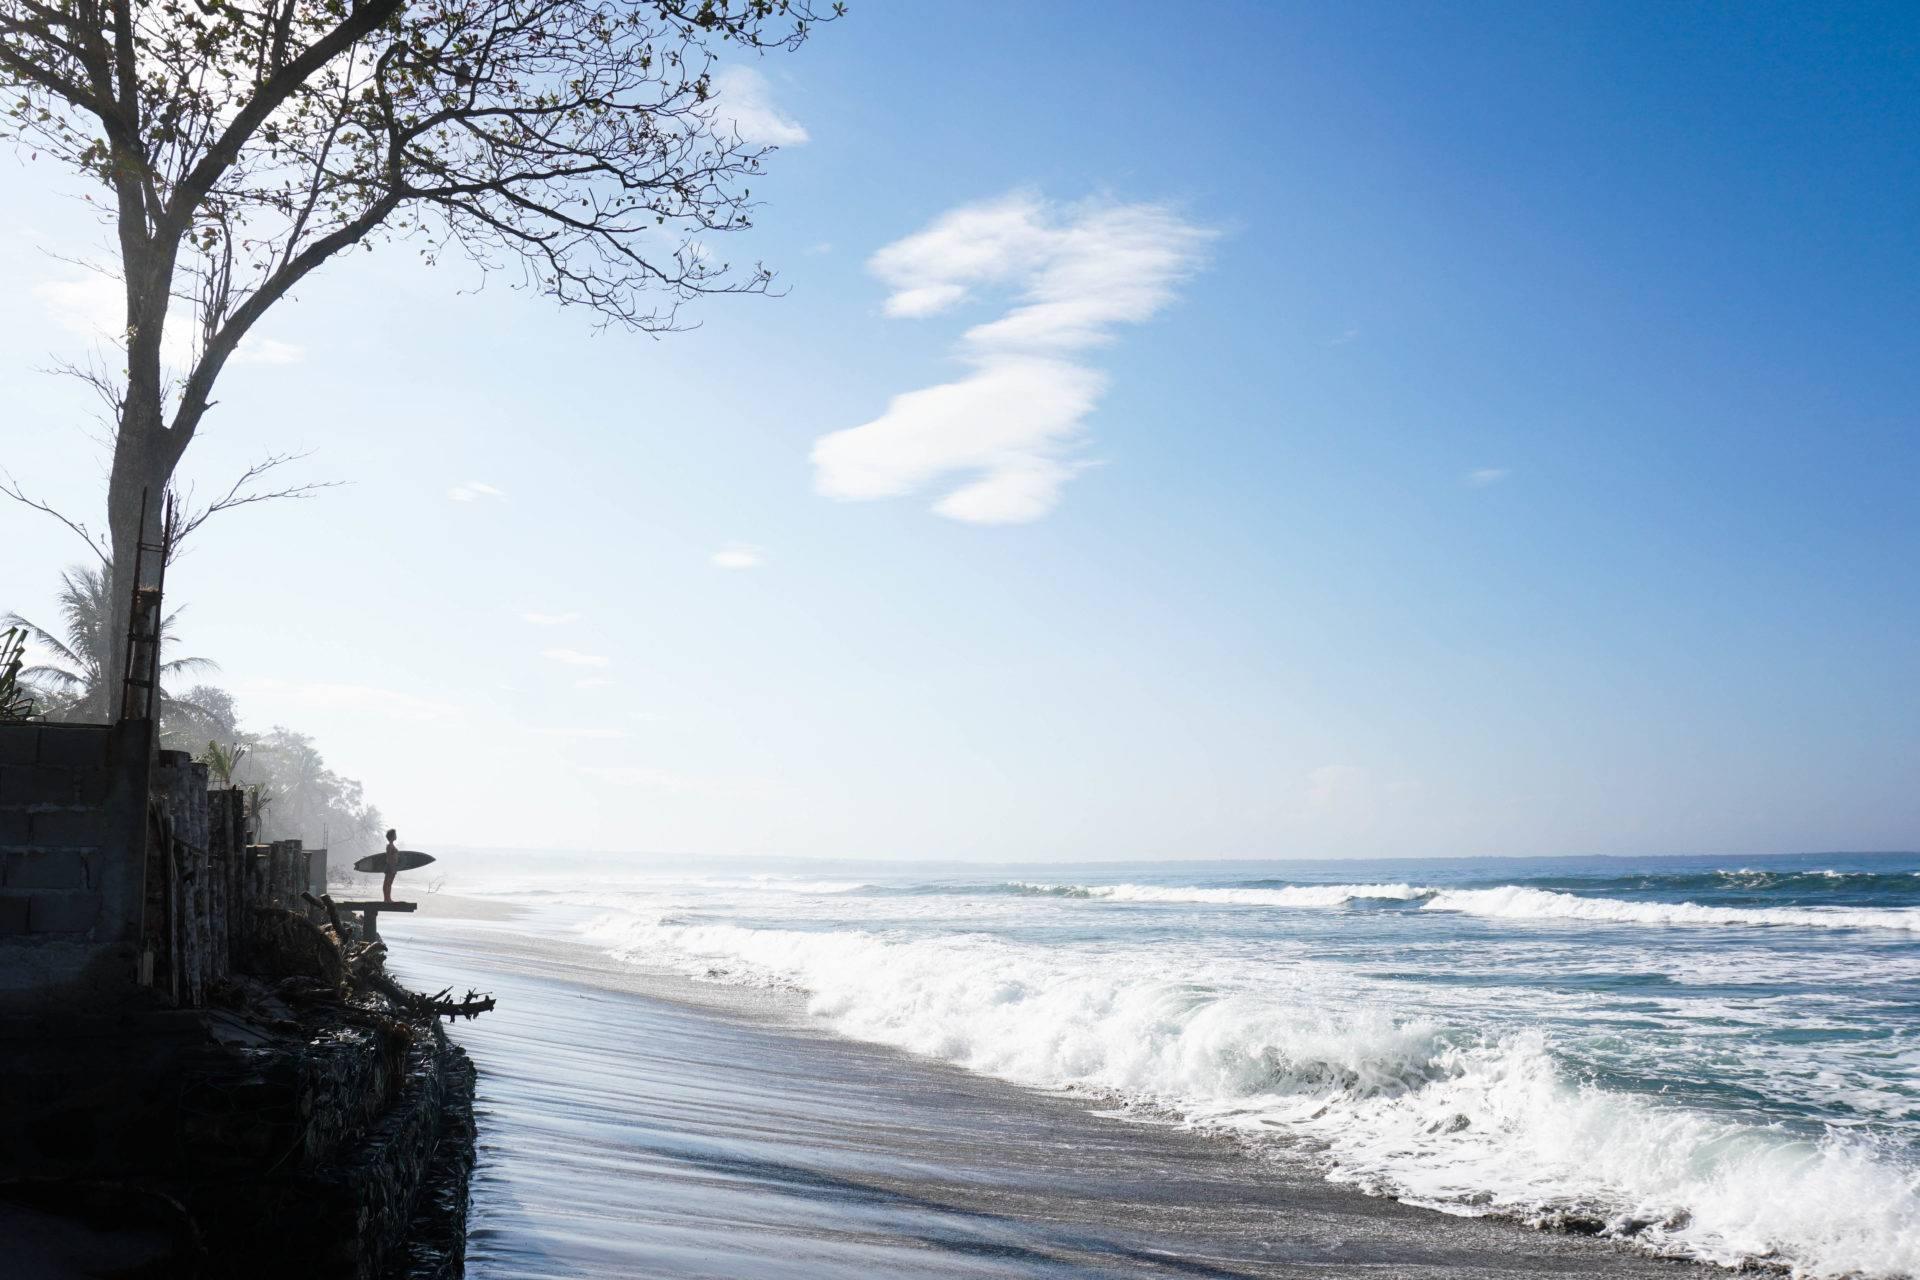 Surfing Krui